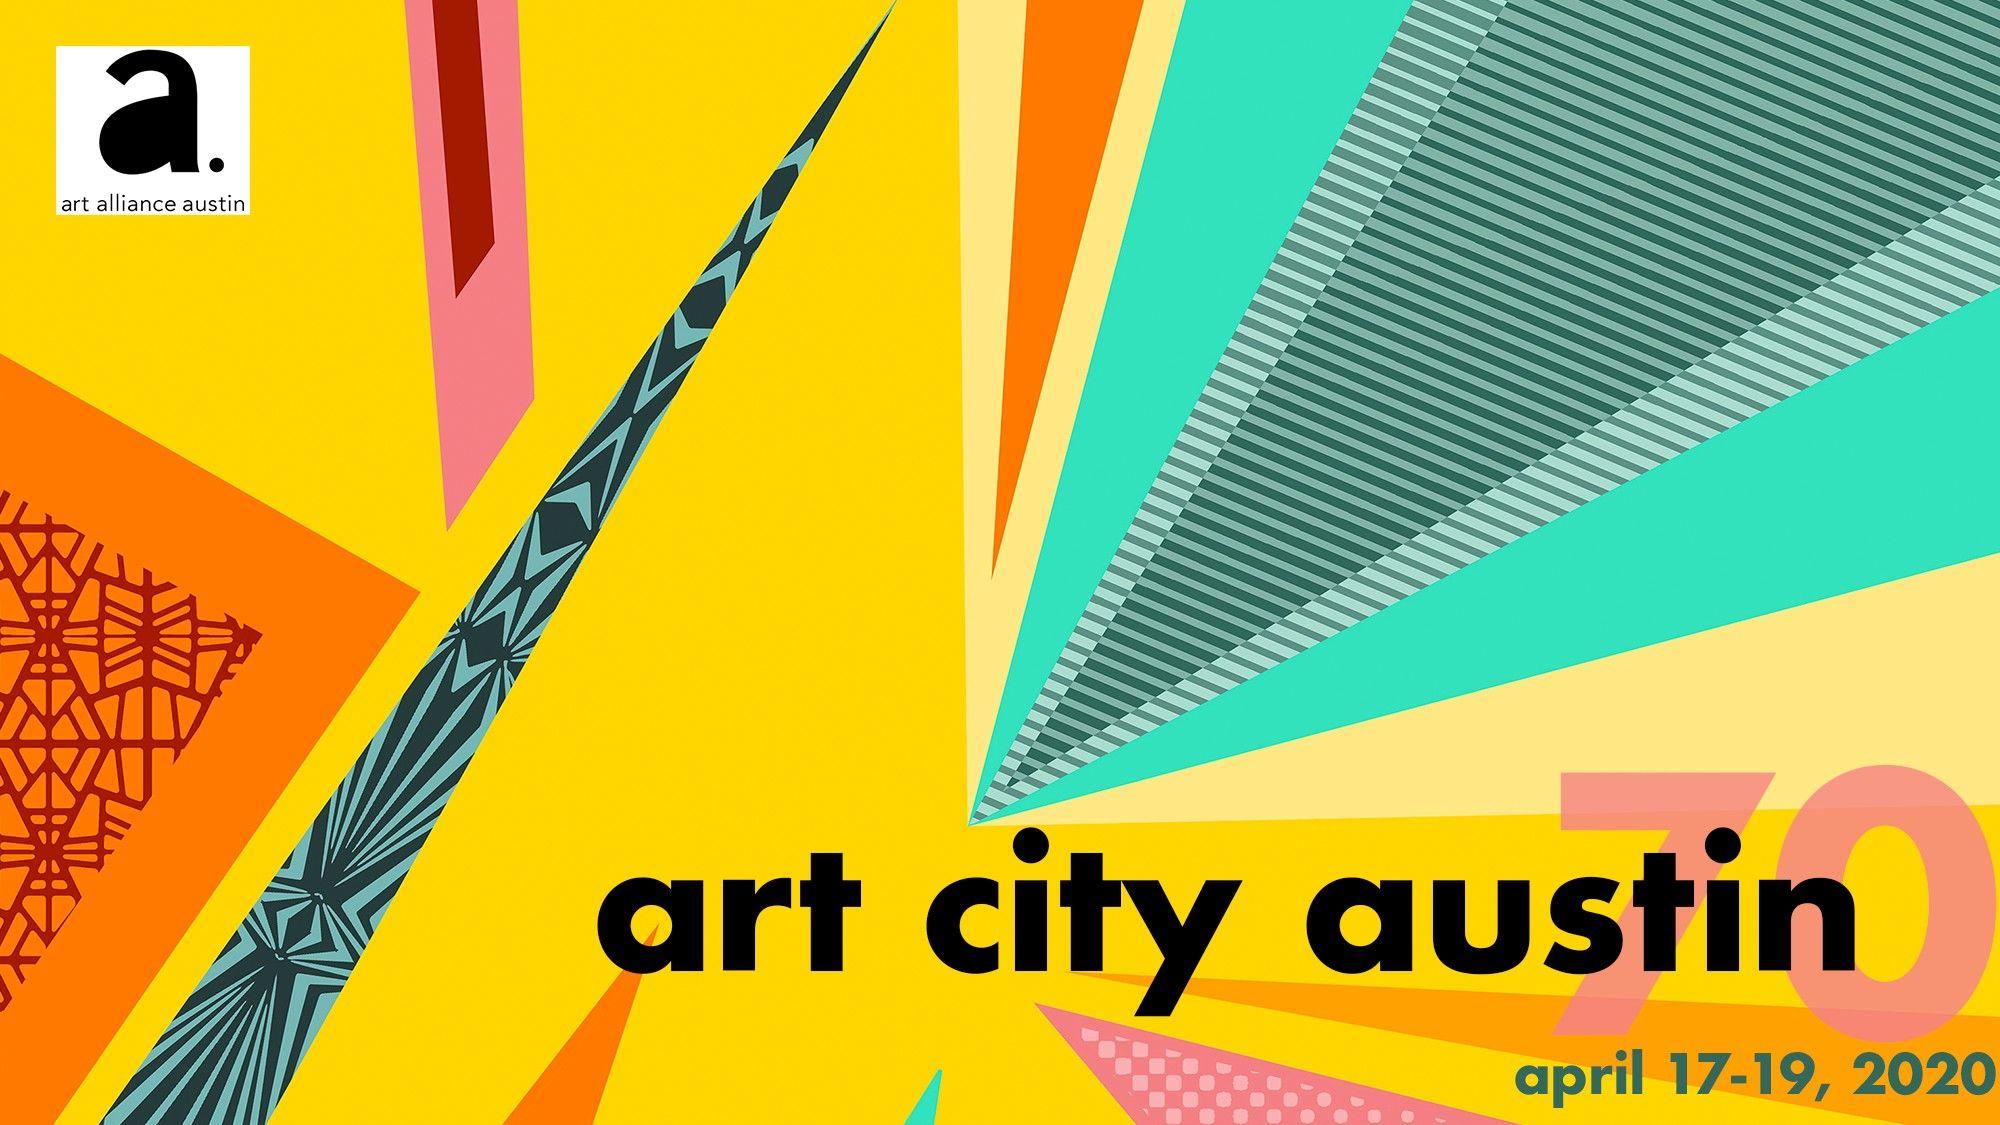 CANCELLED-Art City Austin